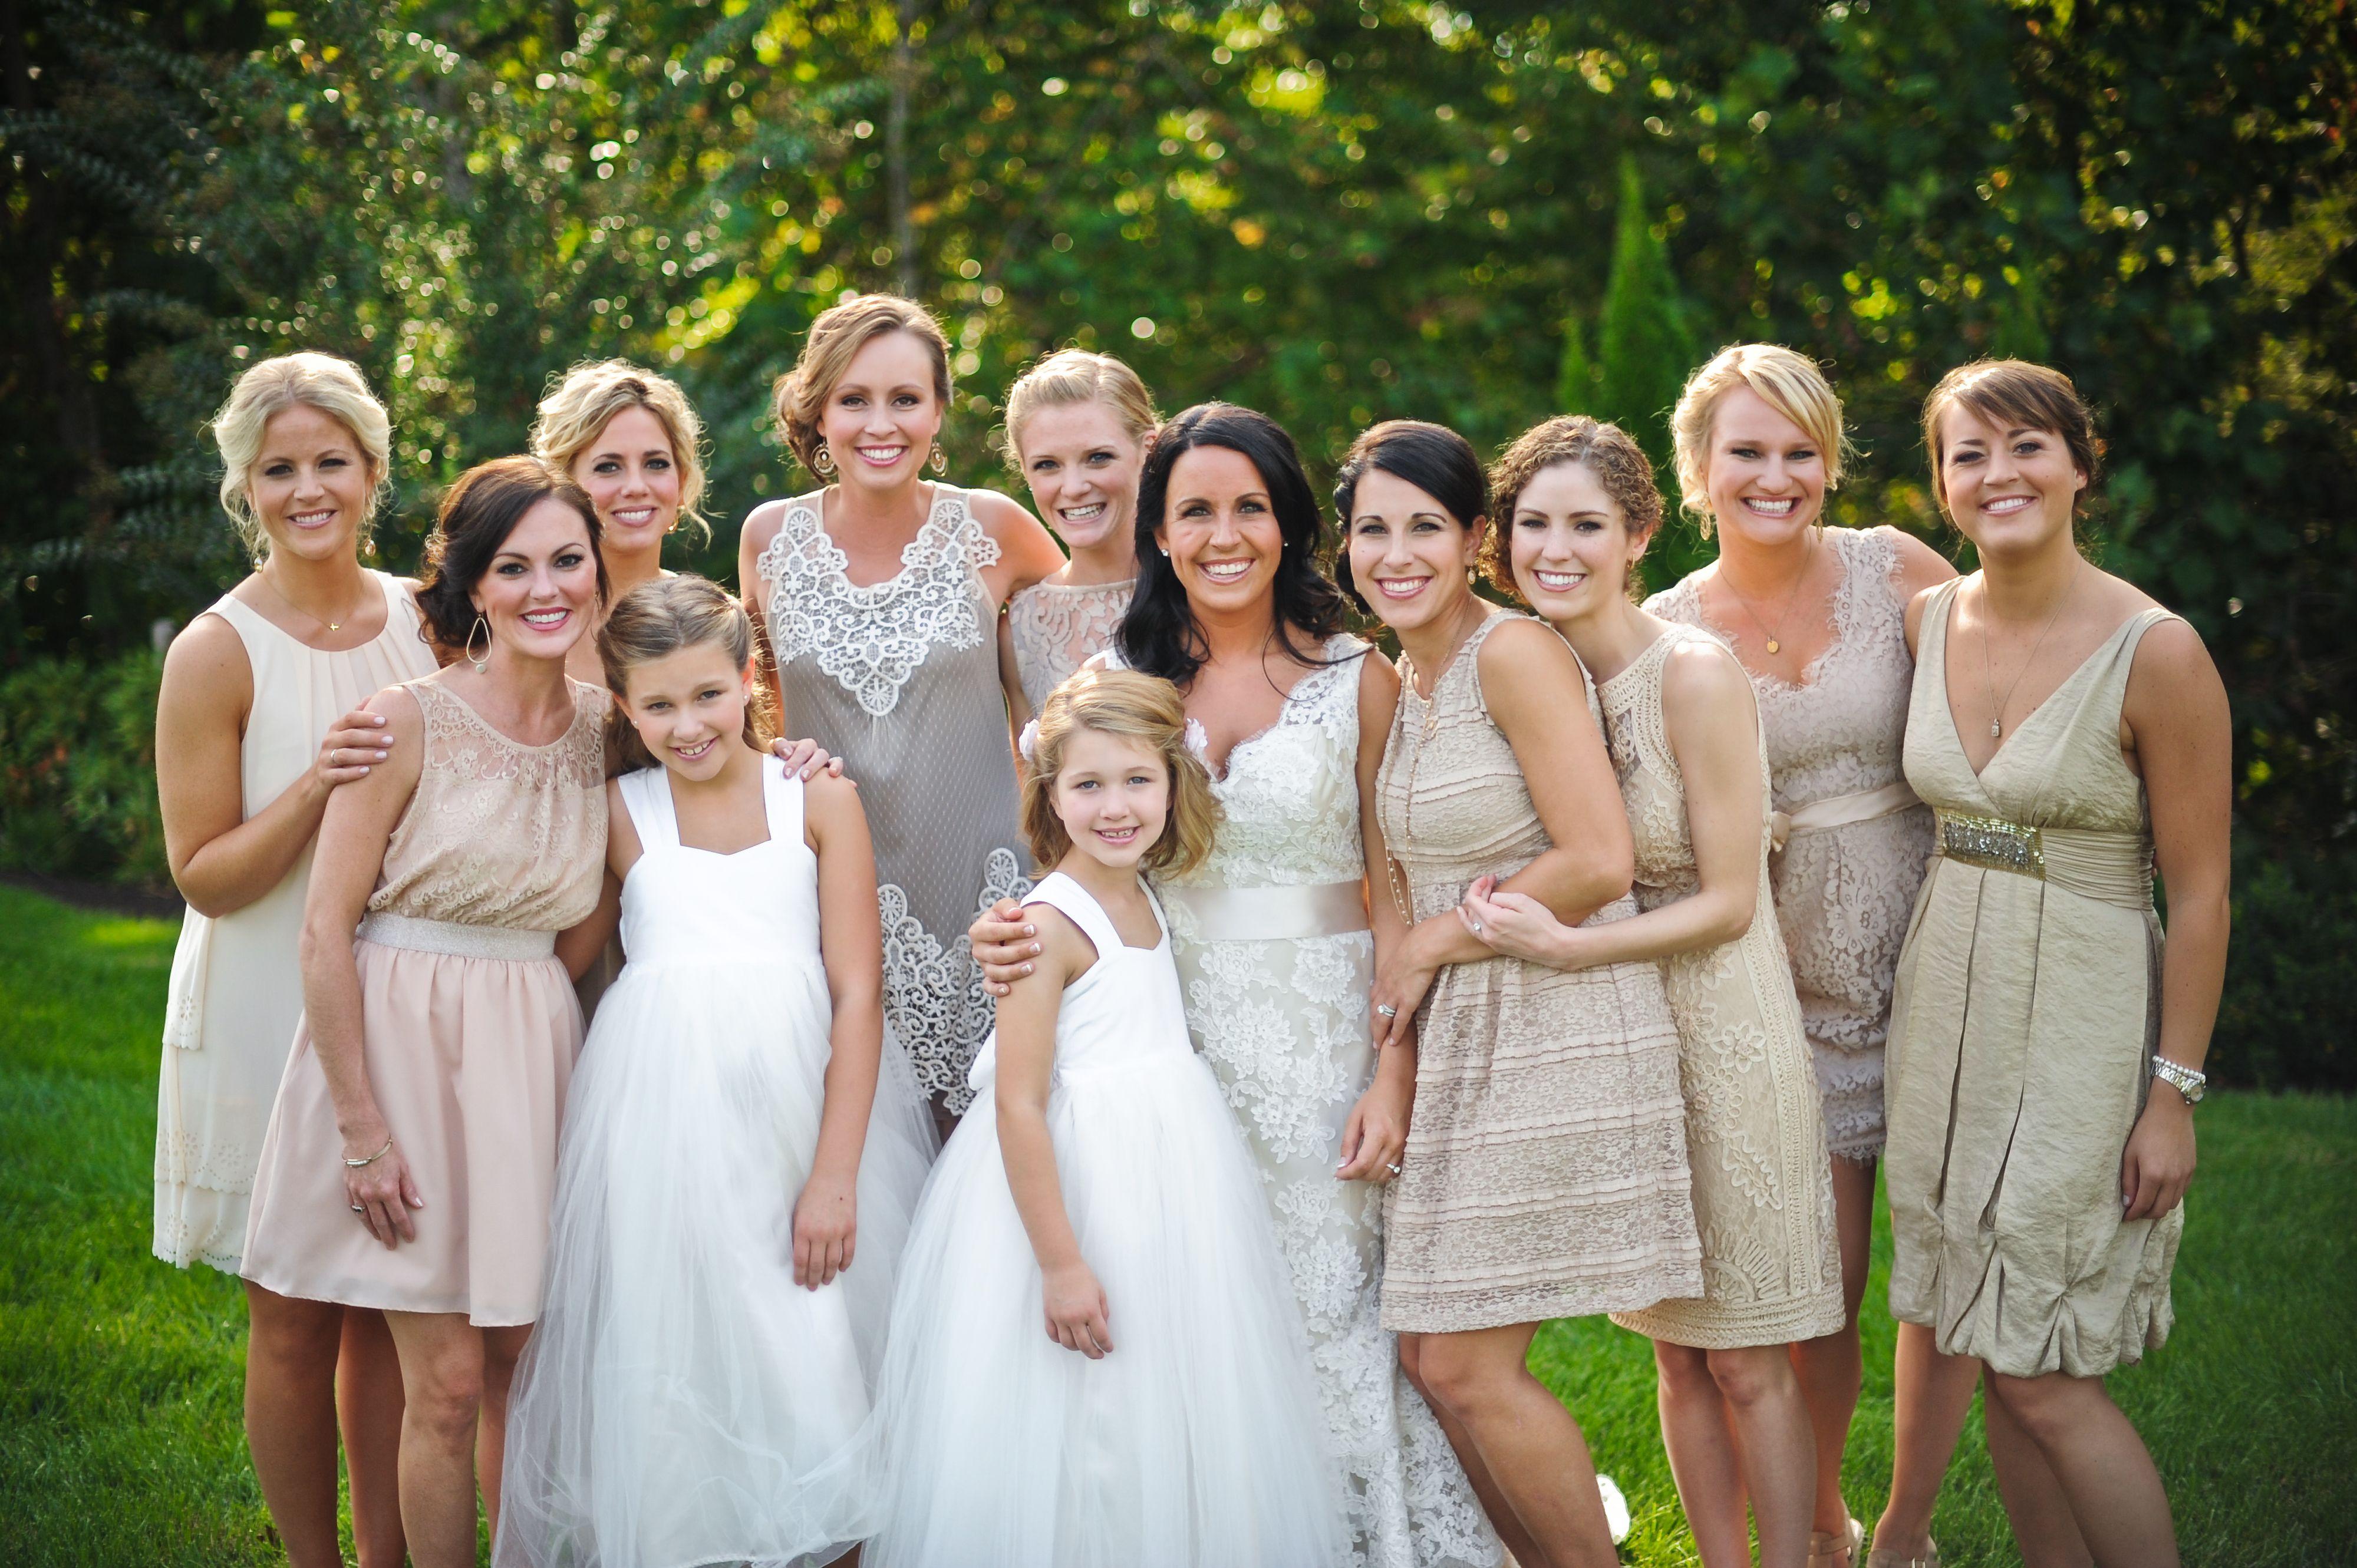 Mixtures of neutral color bridesmaid dresses lauren pinterest mixtures of neutral color bridesmaid dresses ombrellifo Images